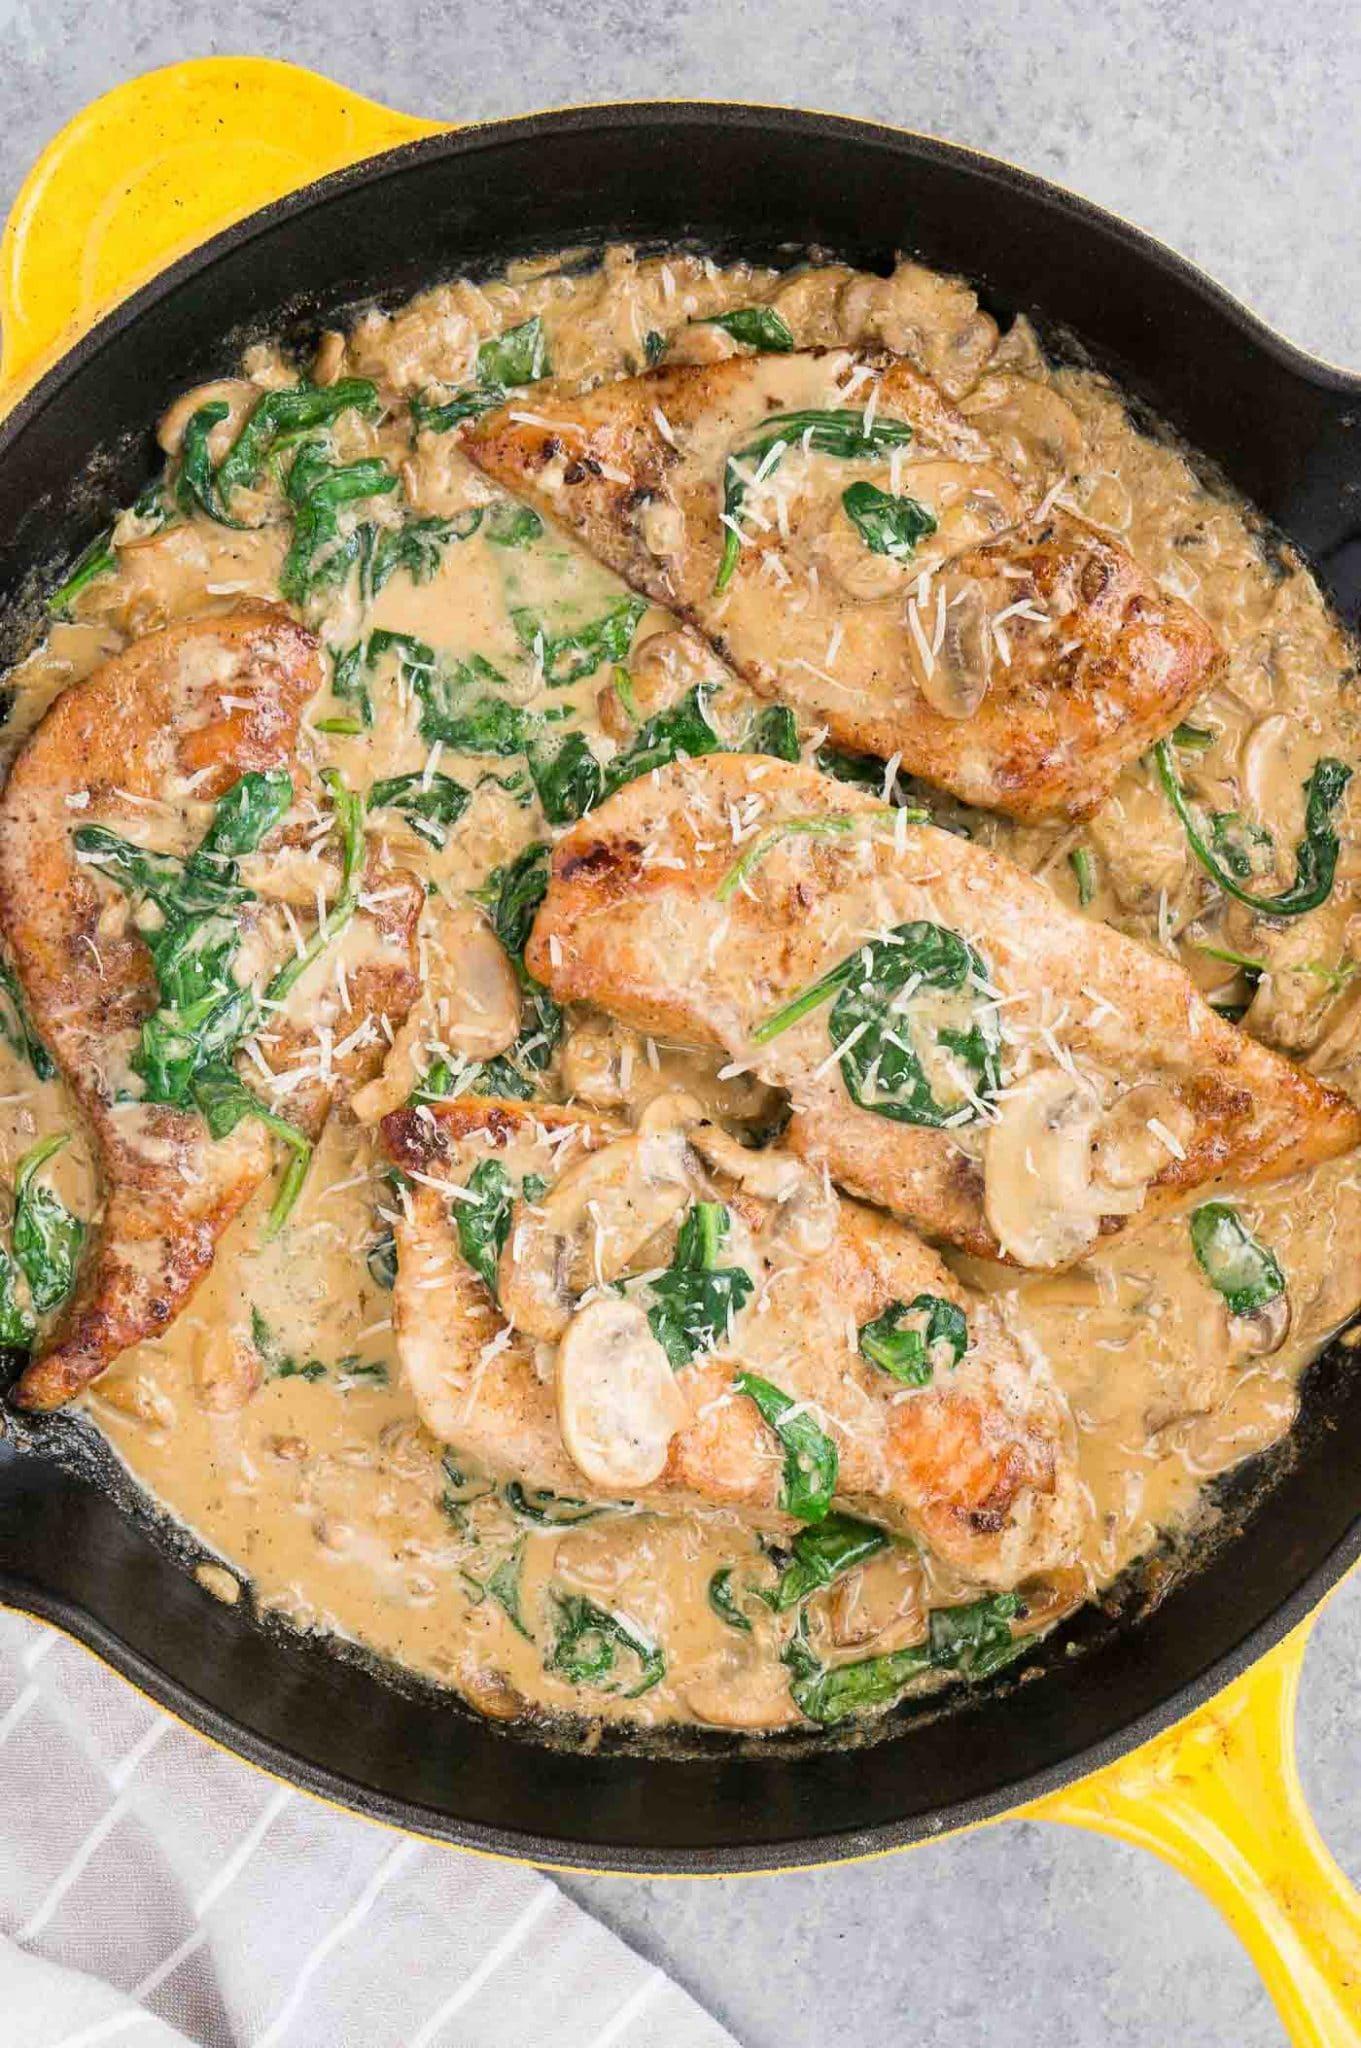 Chicken Florentine style with mushroom sauce